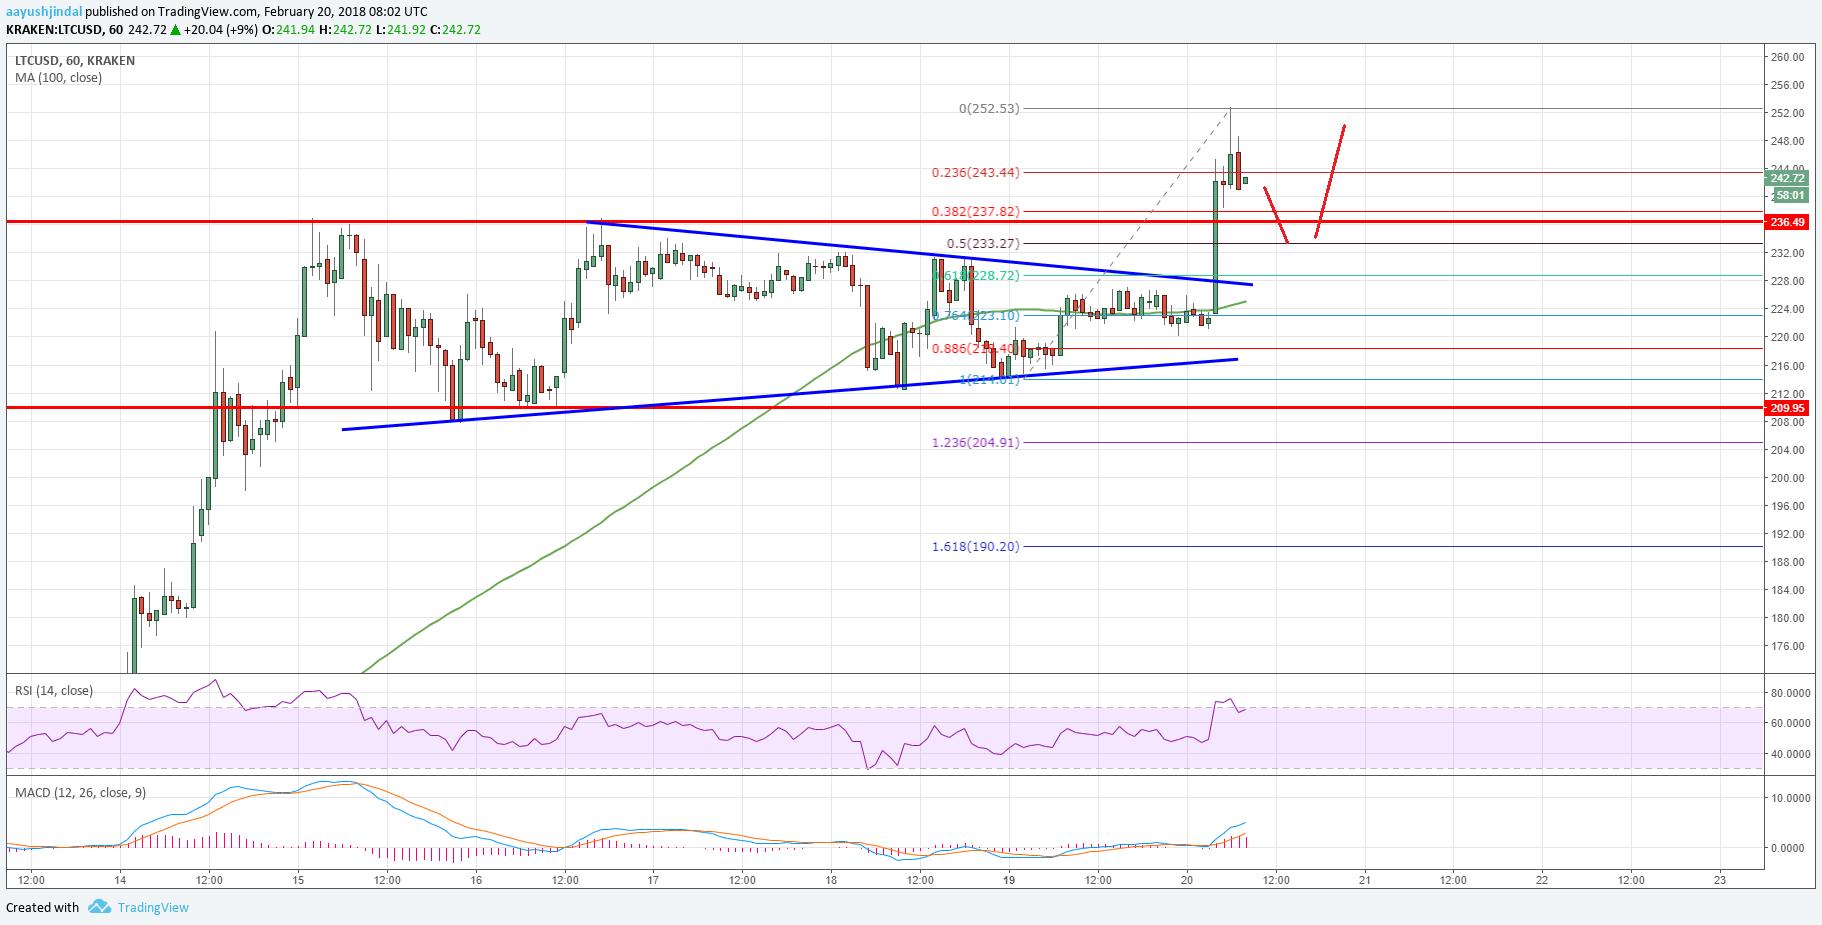 Litecoin Price Analysis: LTC/USD Breaks Key Resistance